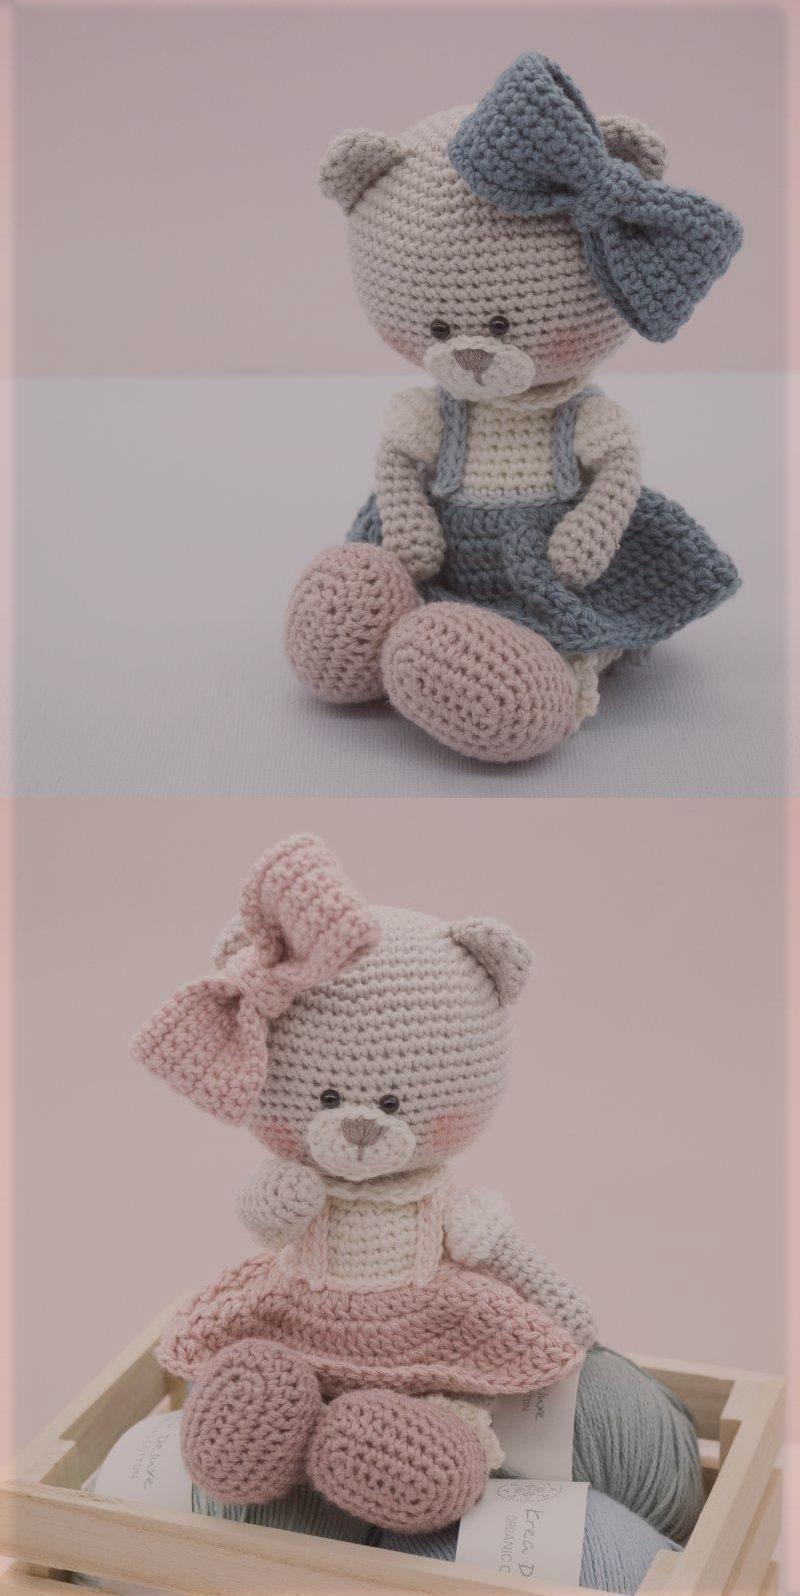 Amigurumi crochet pattern English Millie-Rose the Teddy Bear Amigurum - Amigurum...